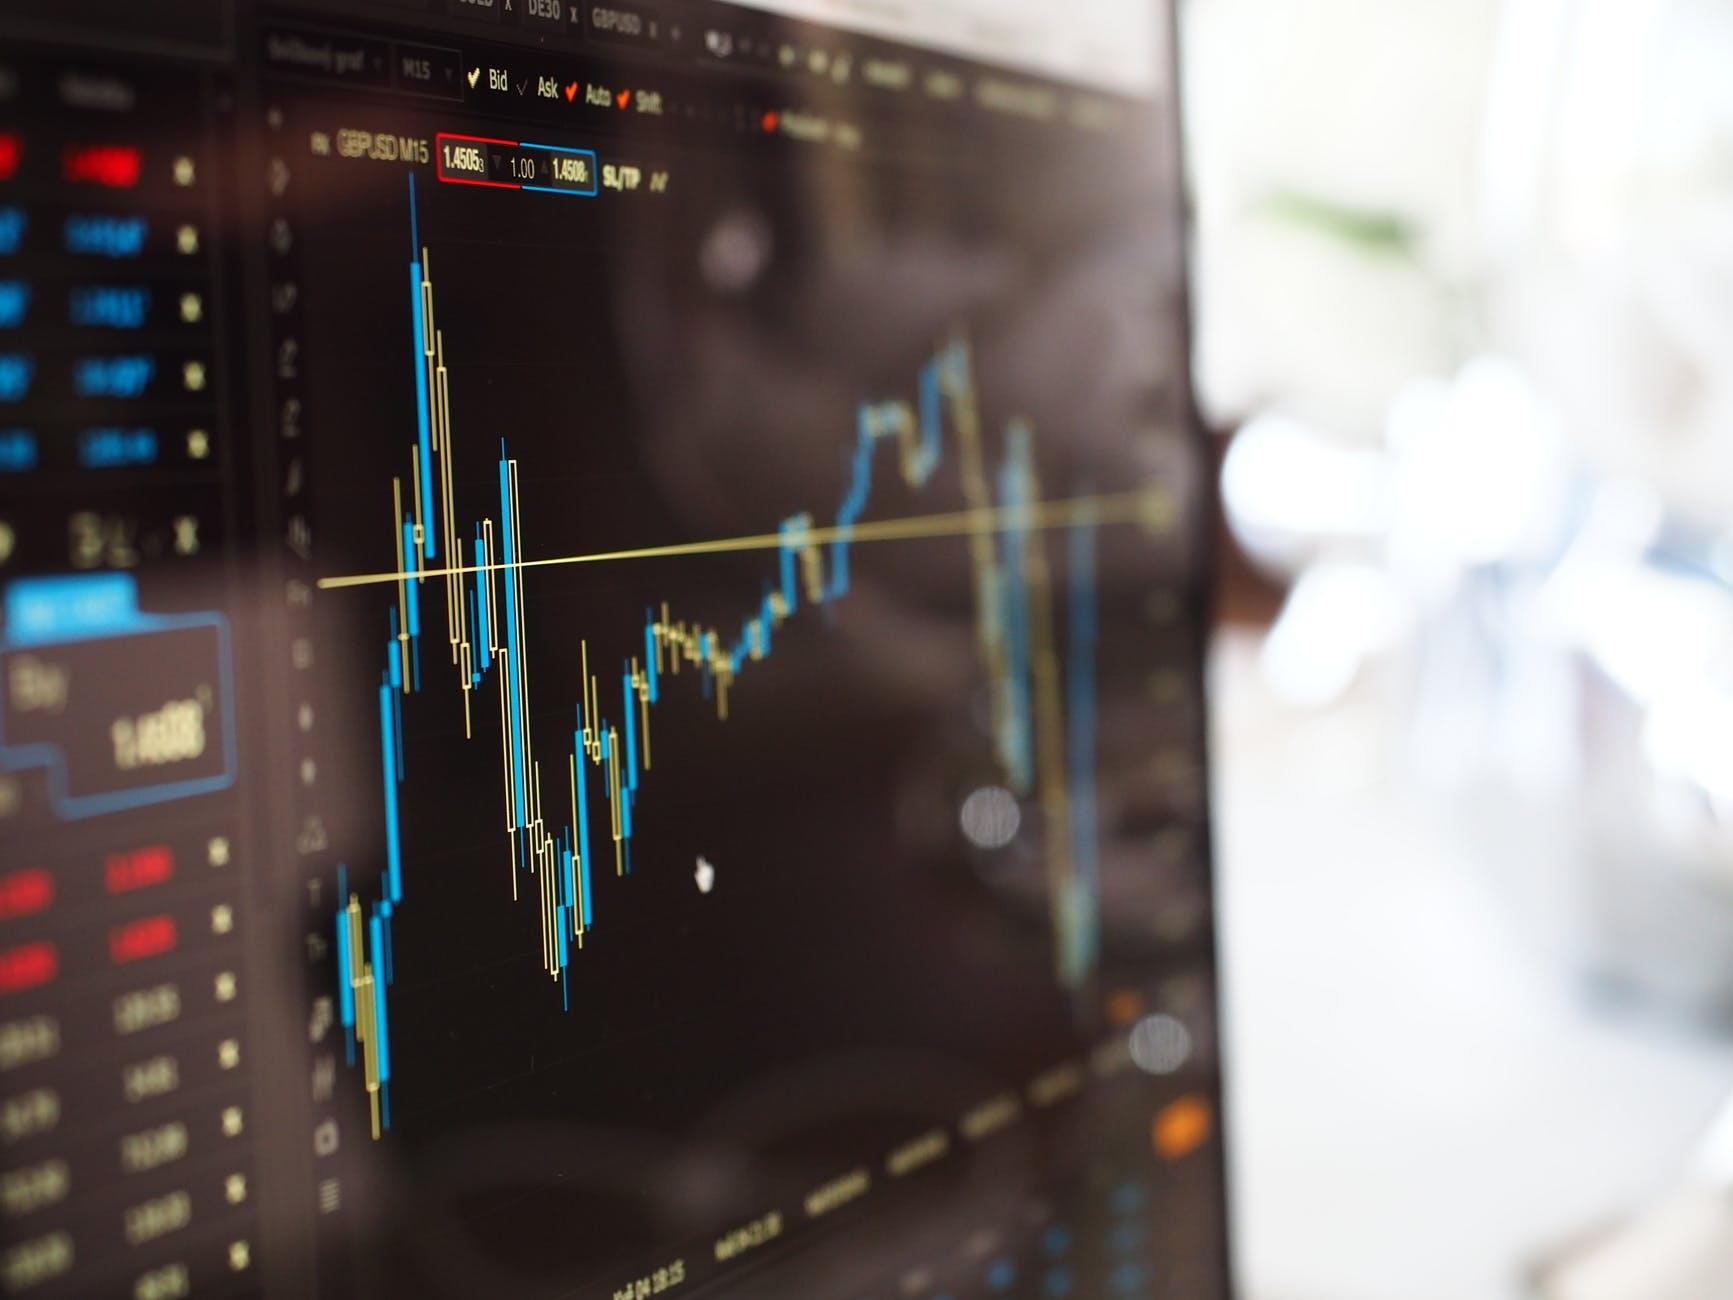 Financial Chart on computer screen